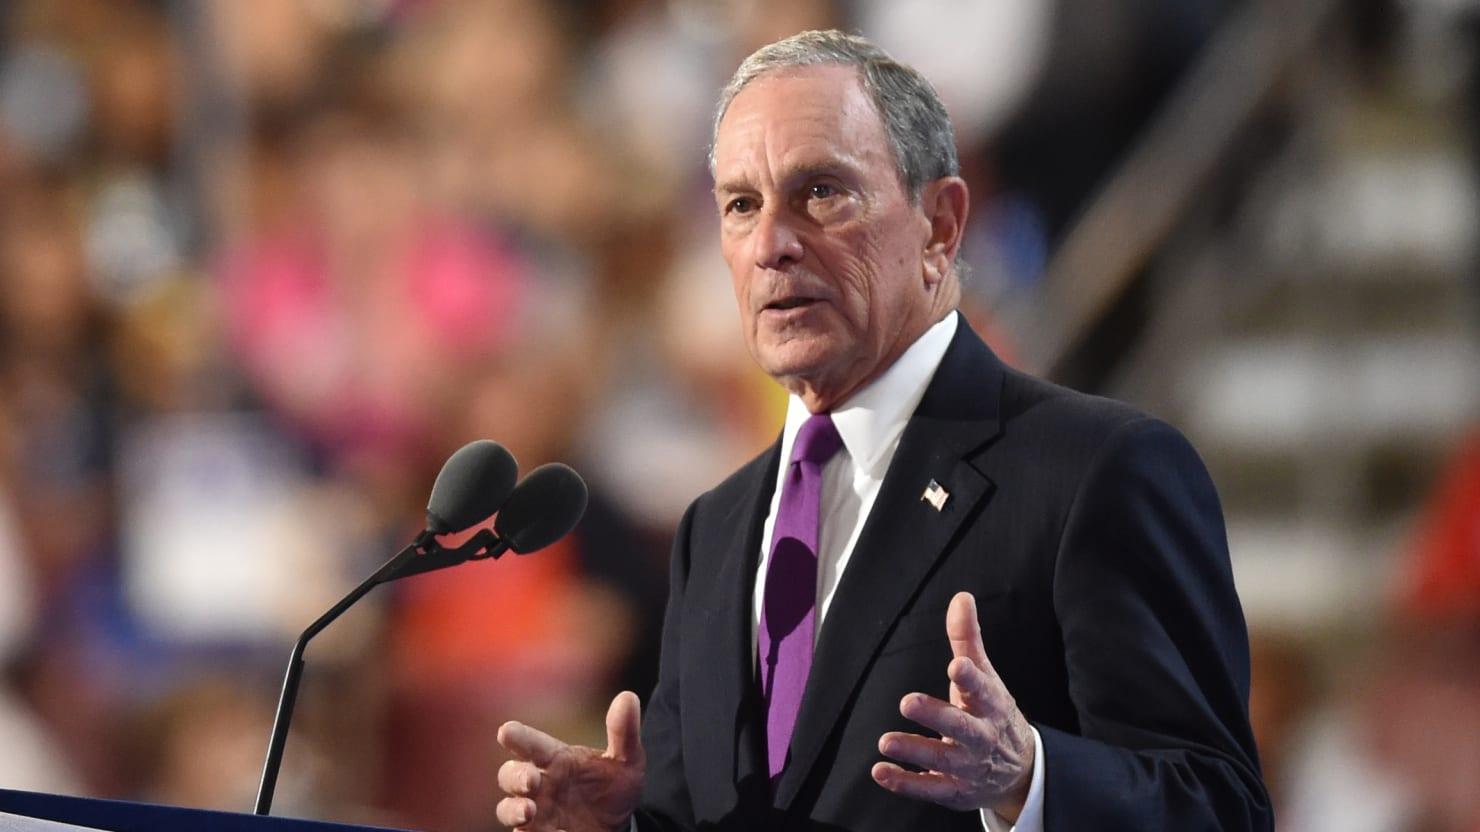 Big Joe Auto >> Billionaire Michael Bloomberg Tames the Bernie Bros at DNC 2016